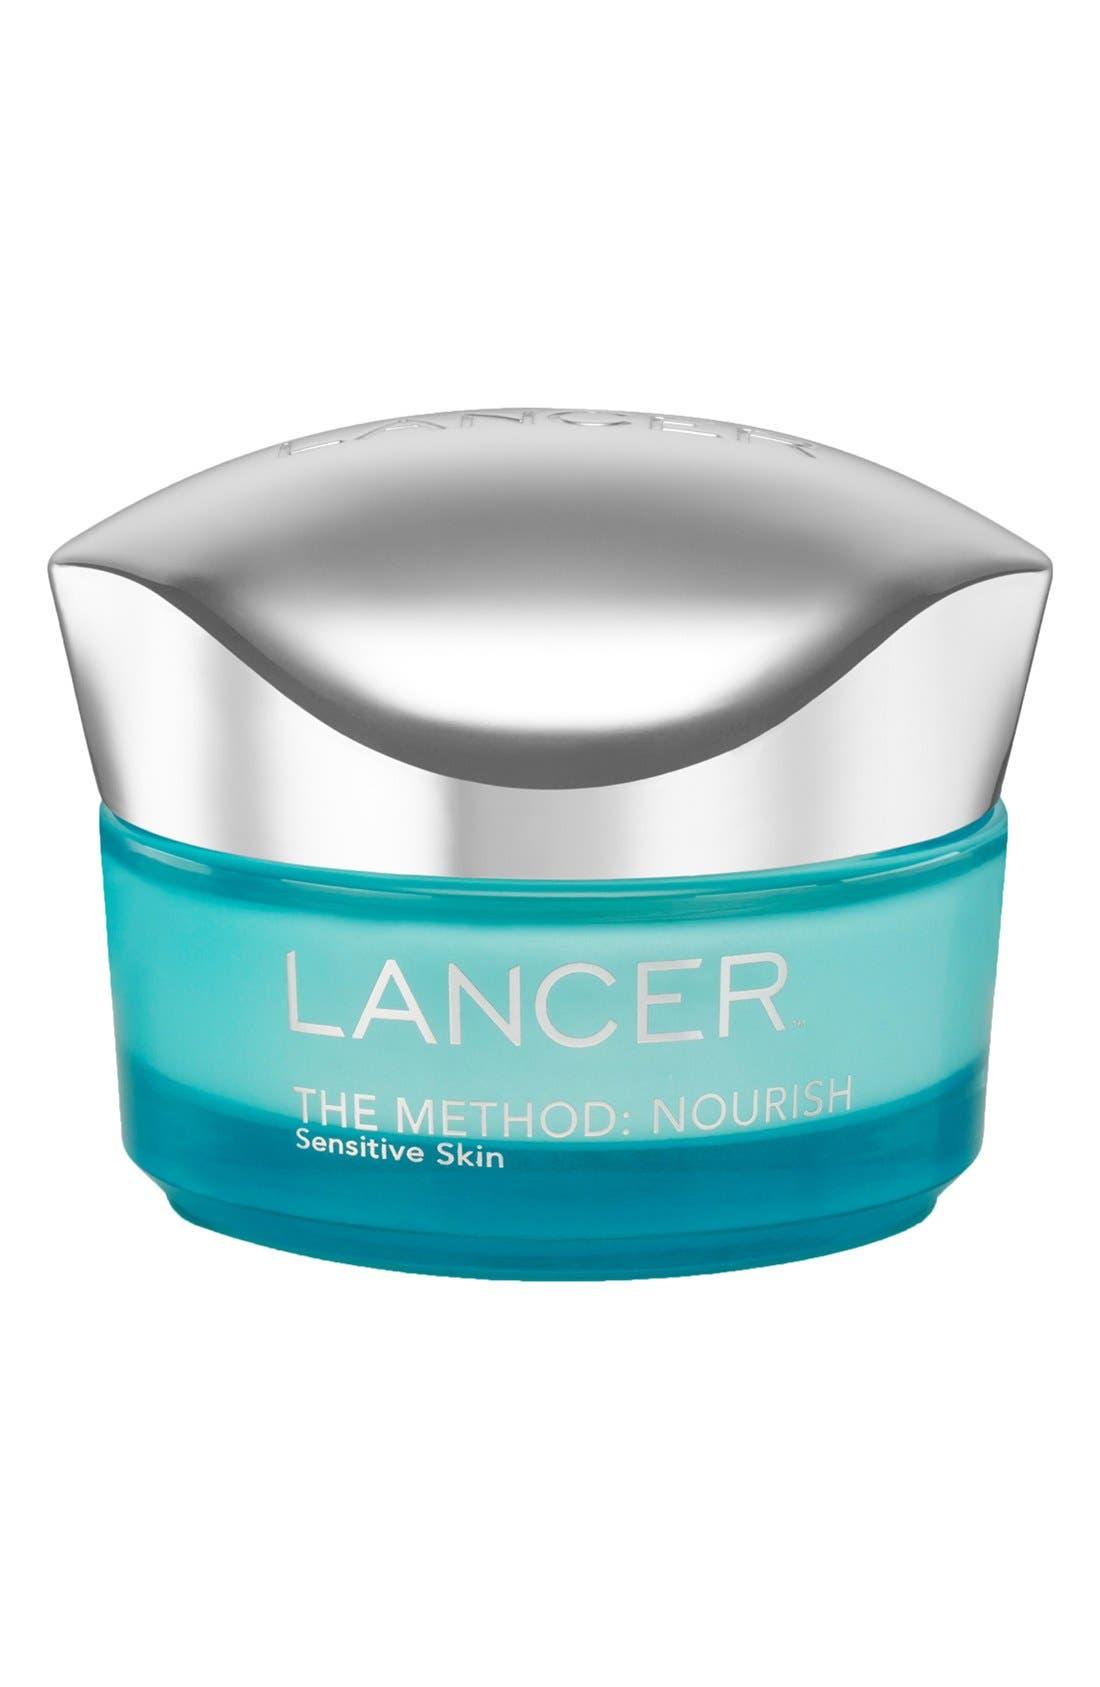 LANCER Skincare The Method - Nourish Sensitive Skin Moisturizer